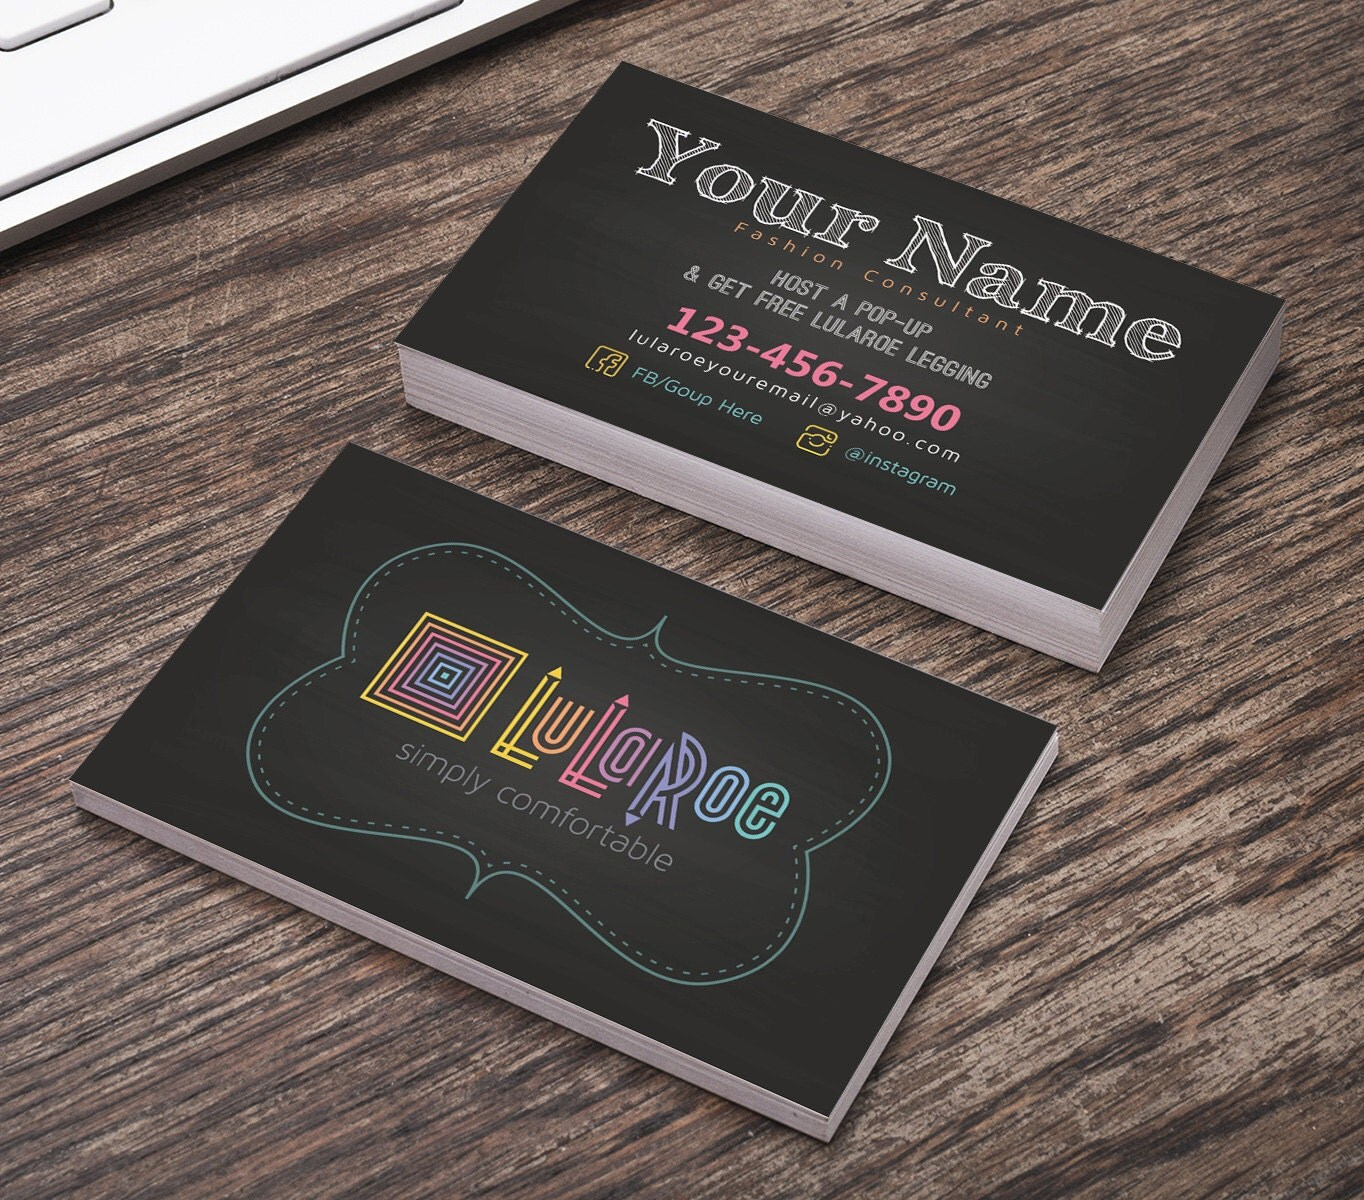 Chalk board style lularoe business cards digital by for Lularoe buisness cards